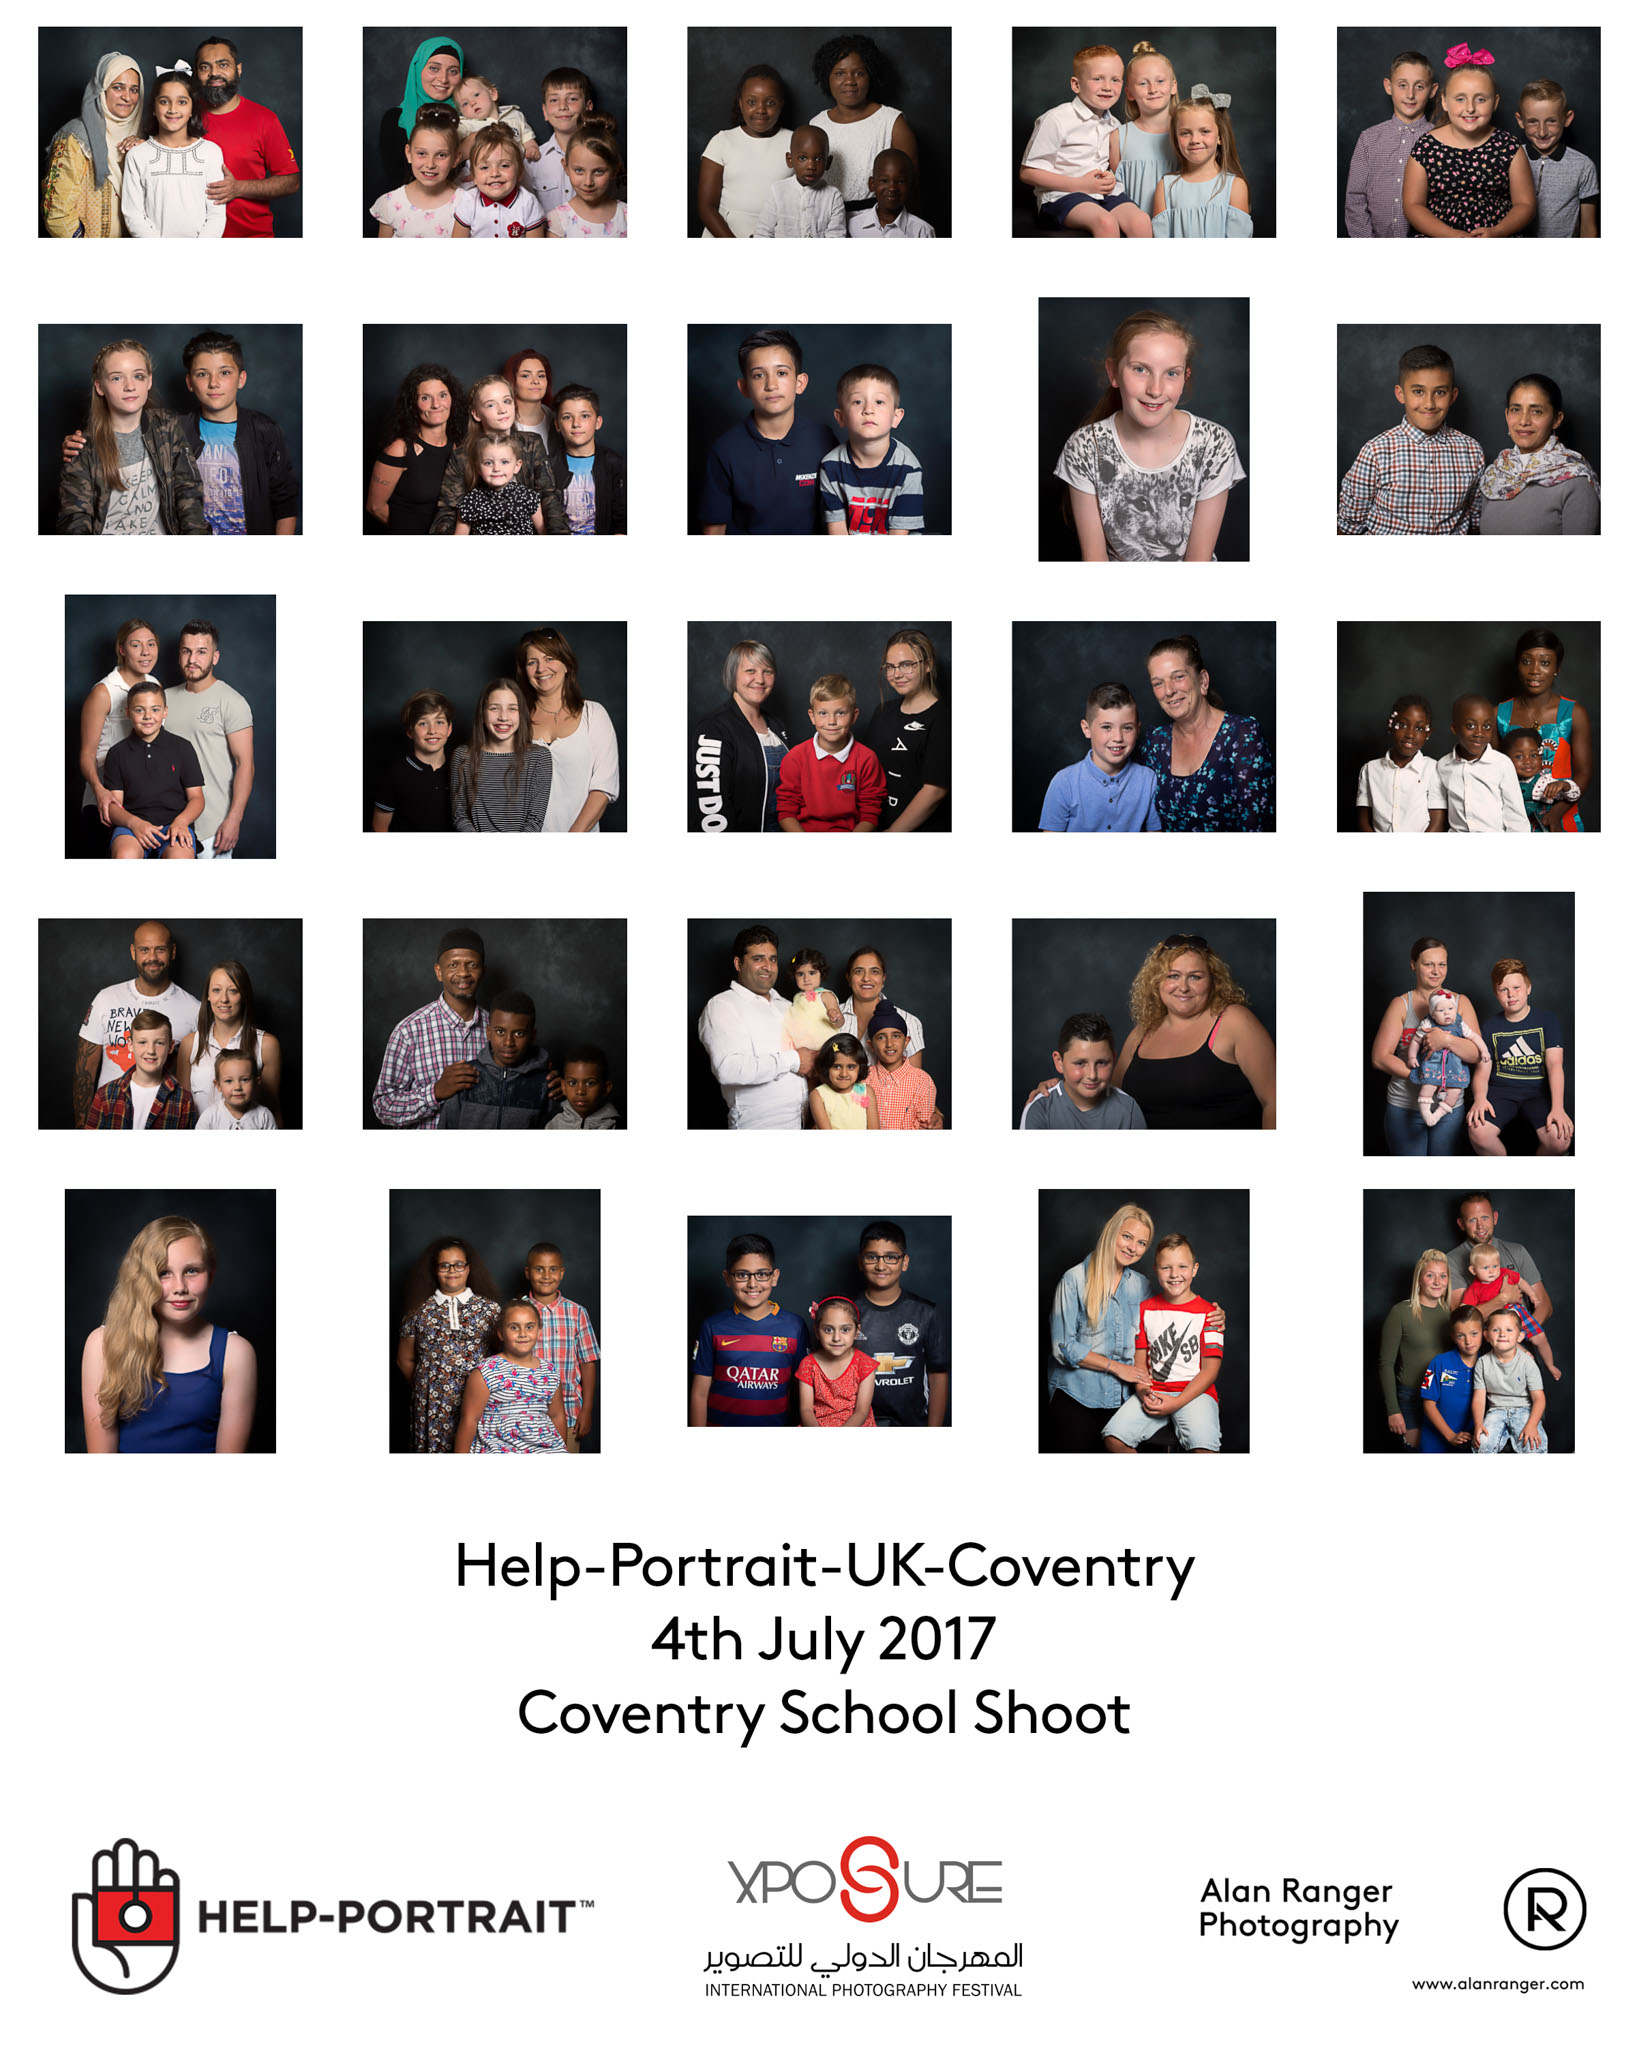 Help-Portrait-UK-Coventry